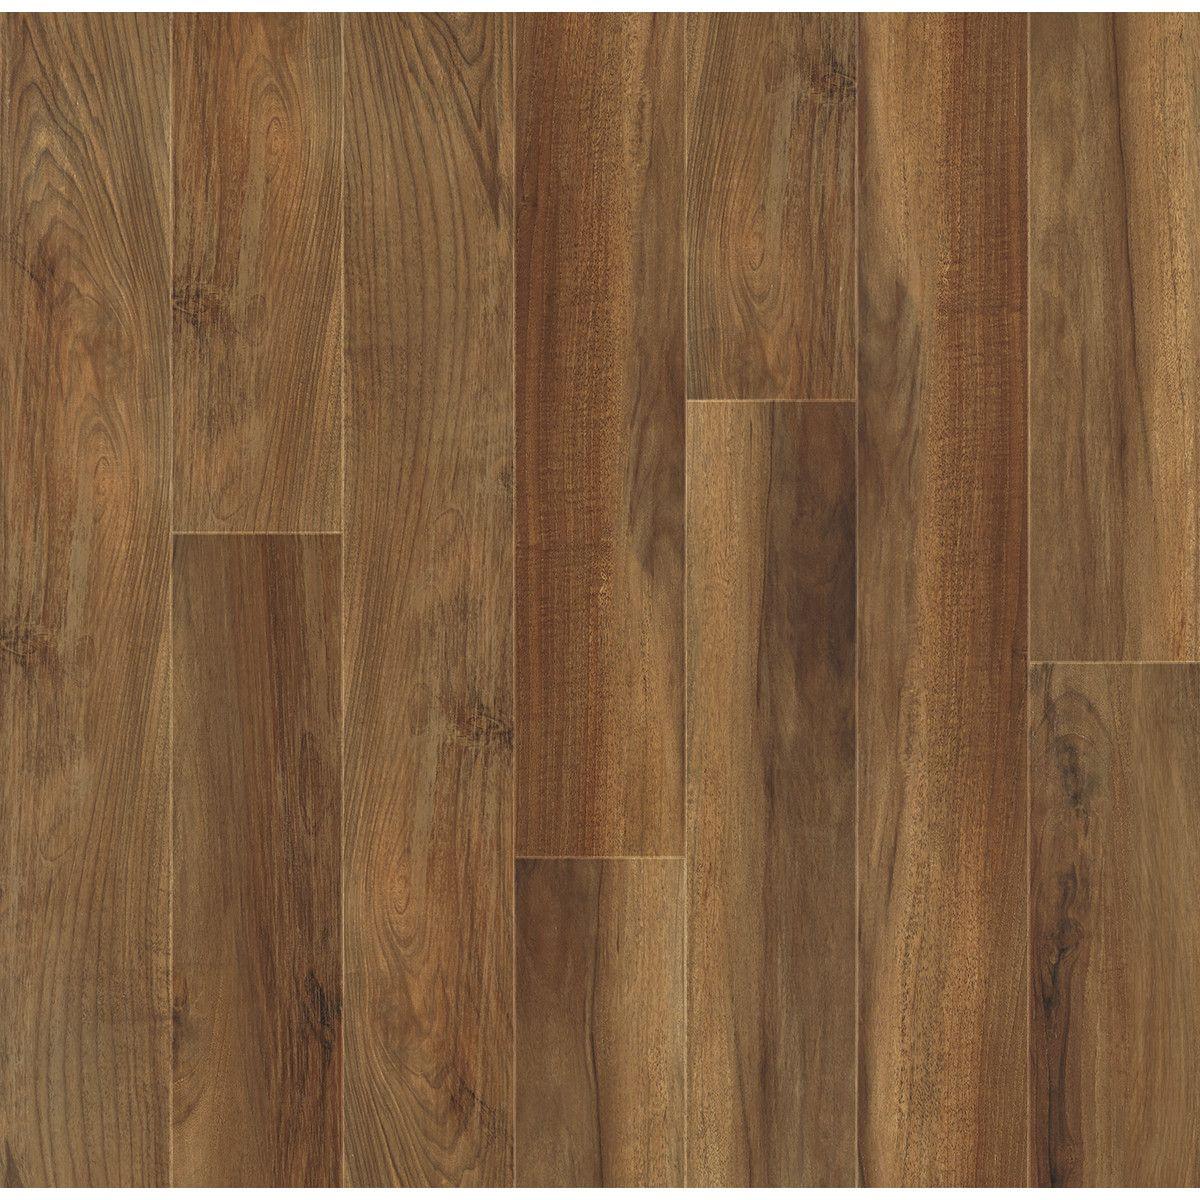 Shaw Floors Winsted 6 X 48 X 5 5mm Luxury Vinyl Plank In Saybrook Vinyl Plank Flooring Vinyl Flooring Vinyl Plank